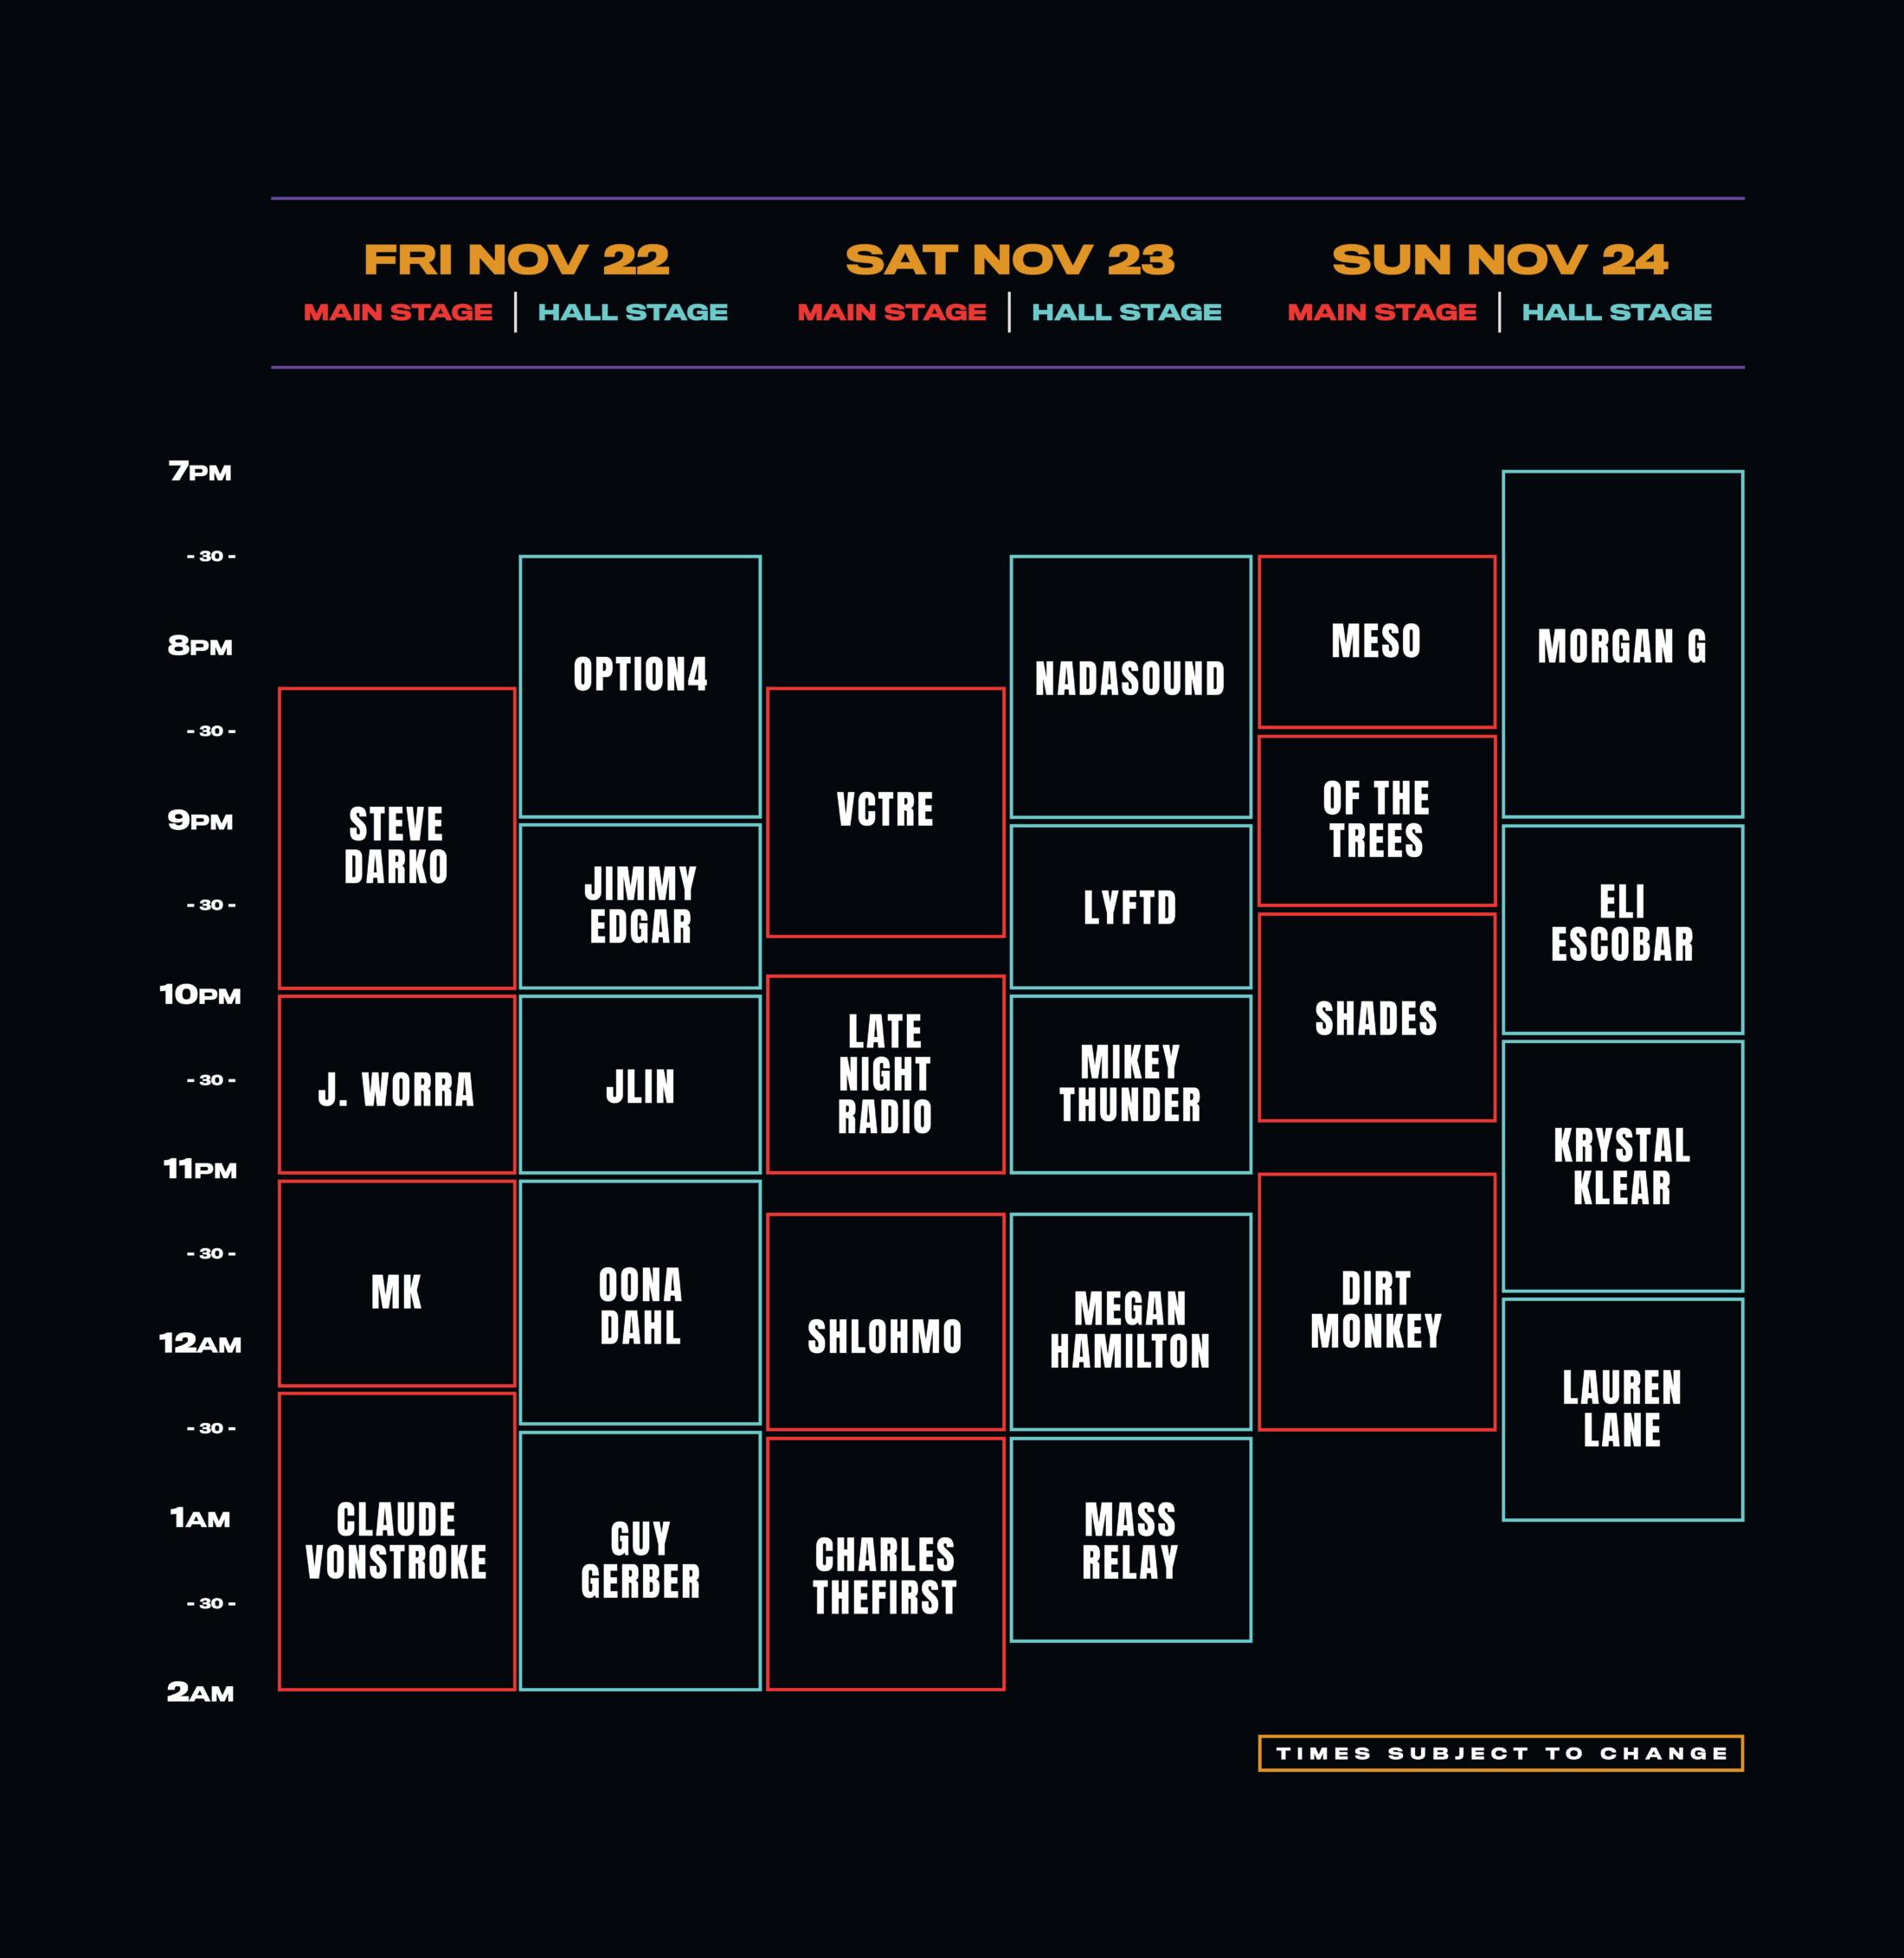 Dark Palace Shedule, Full lineup